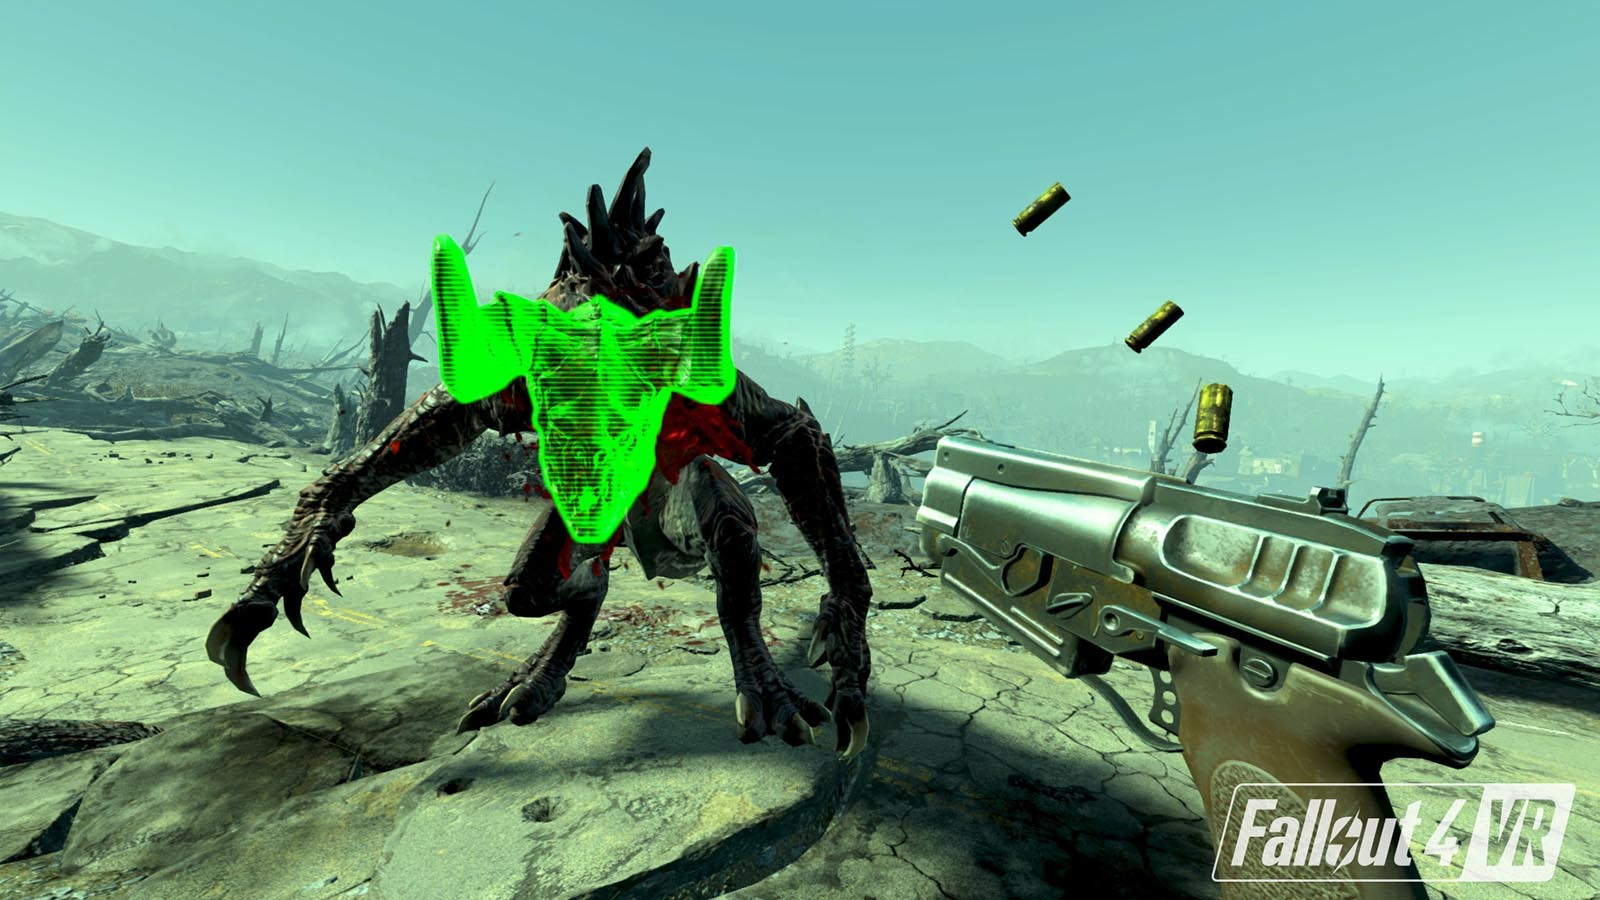 Fallout 4 SVAV